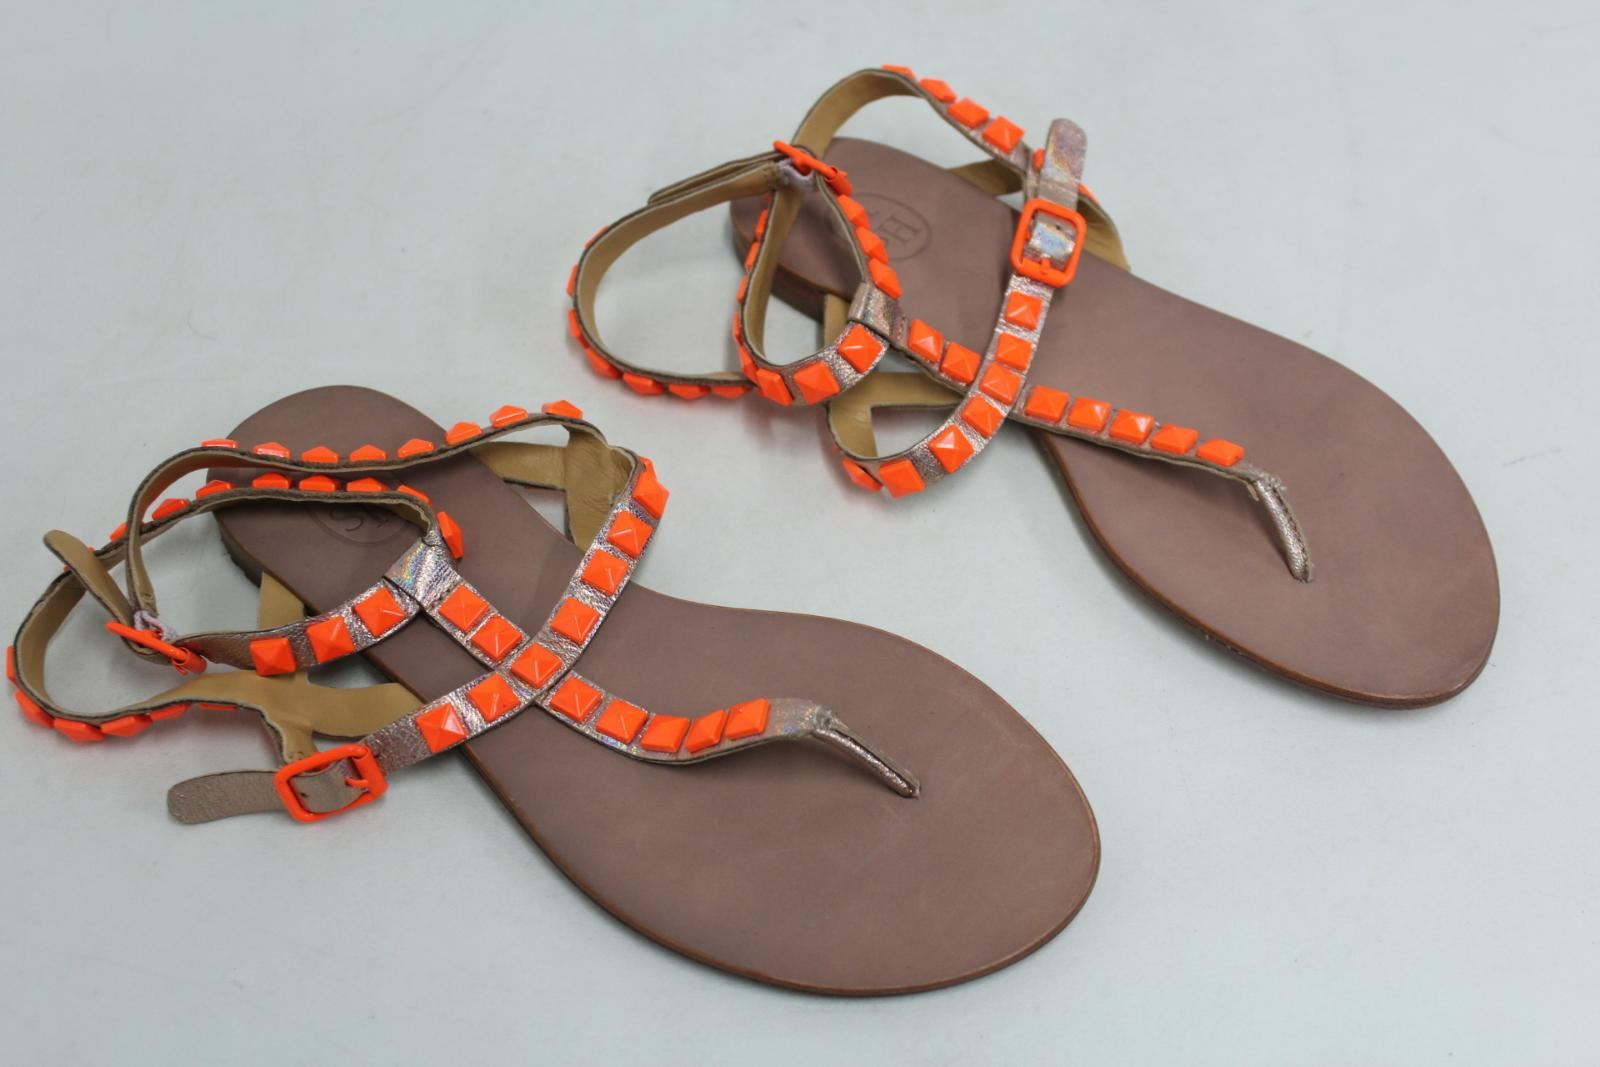 ASH Ladies Neon orange Studded Leather Metallic Sandals shoes Size UK5 EU37